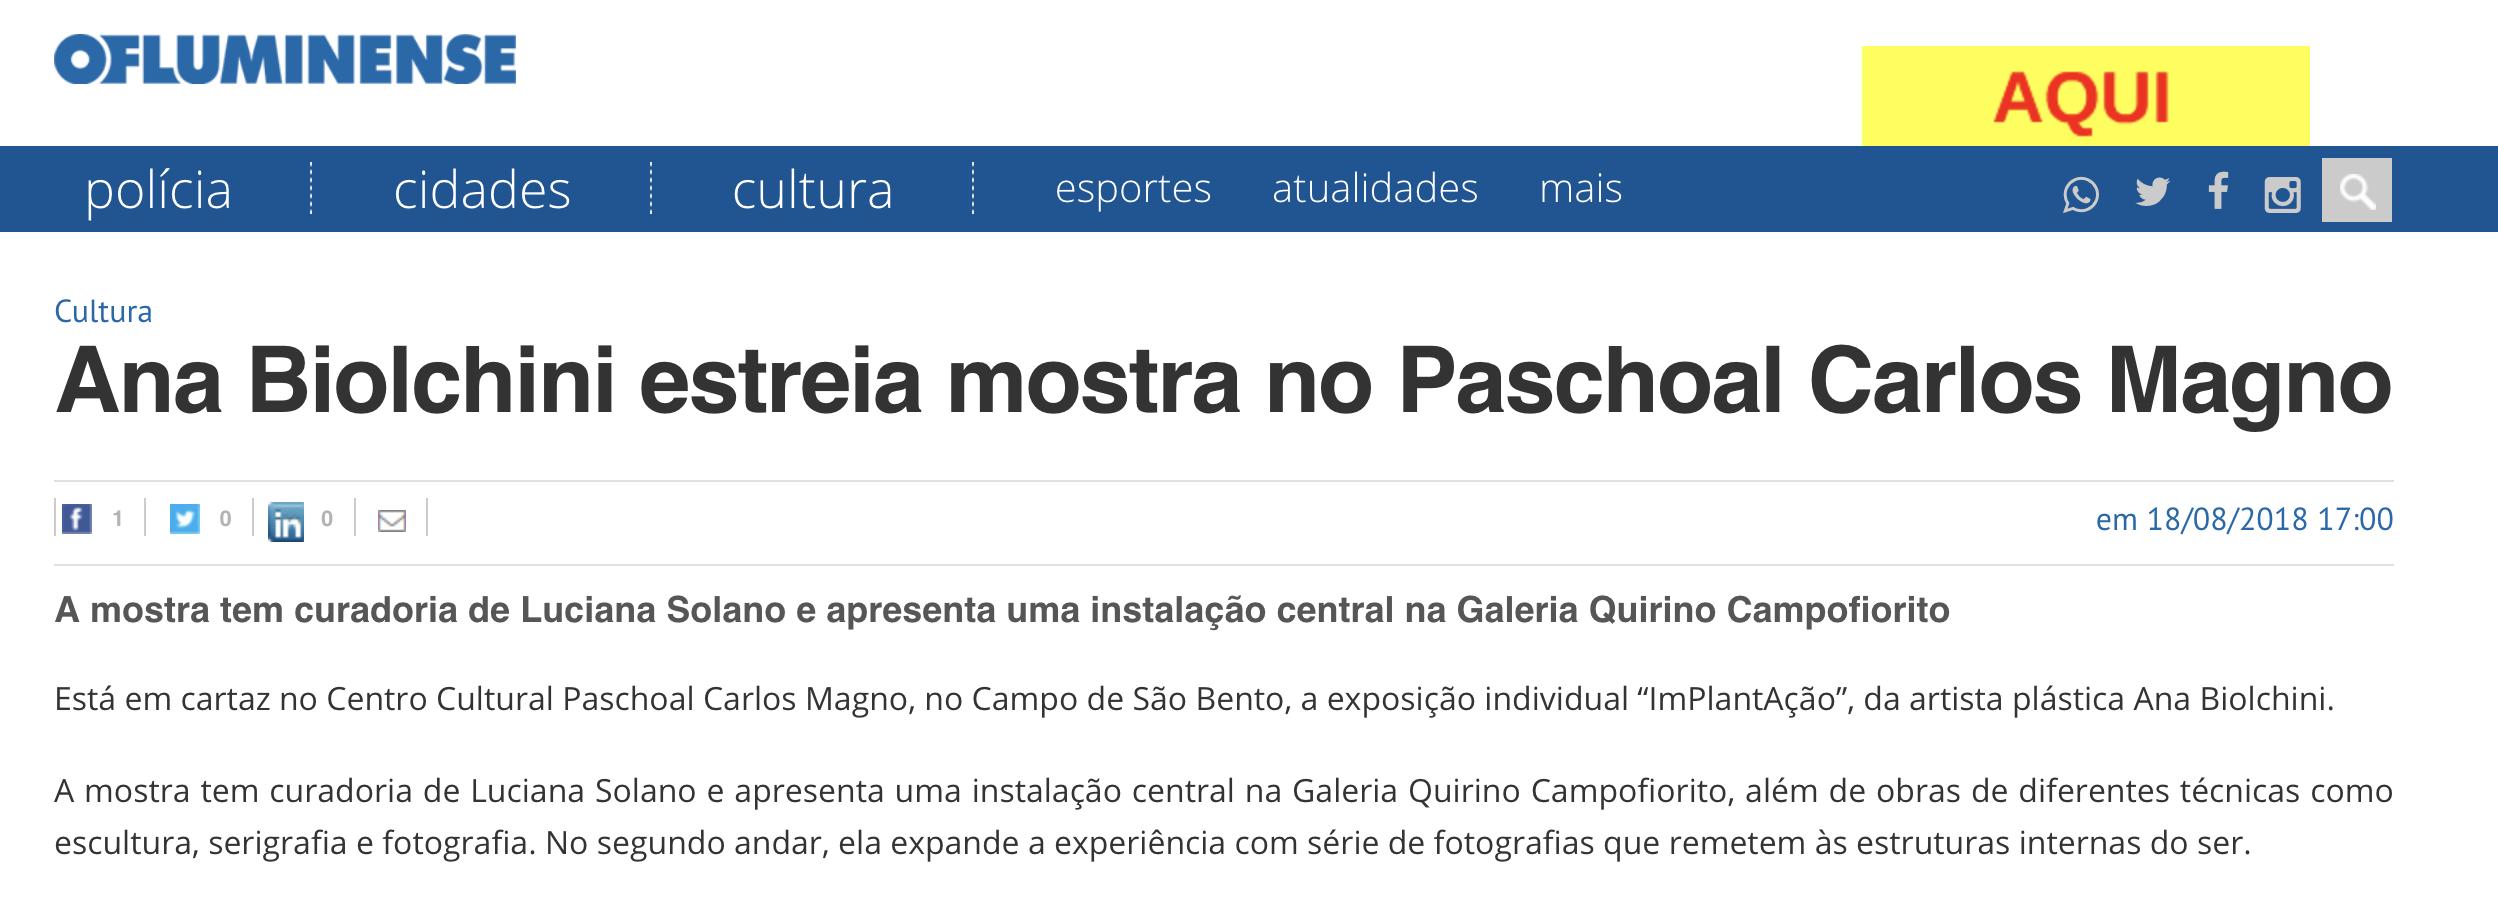 O Fluminense.png